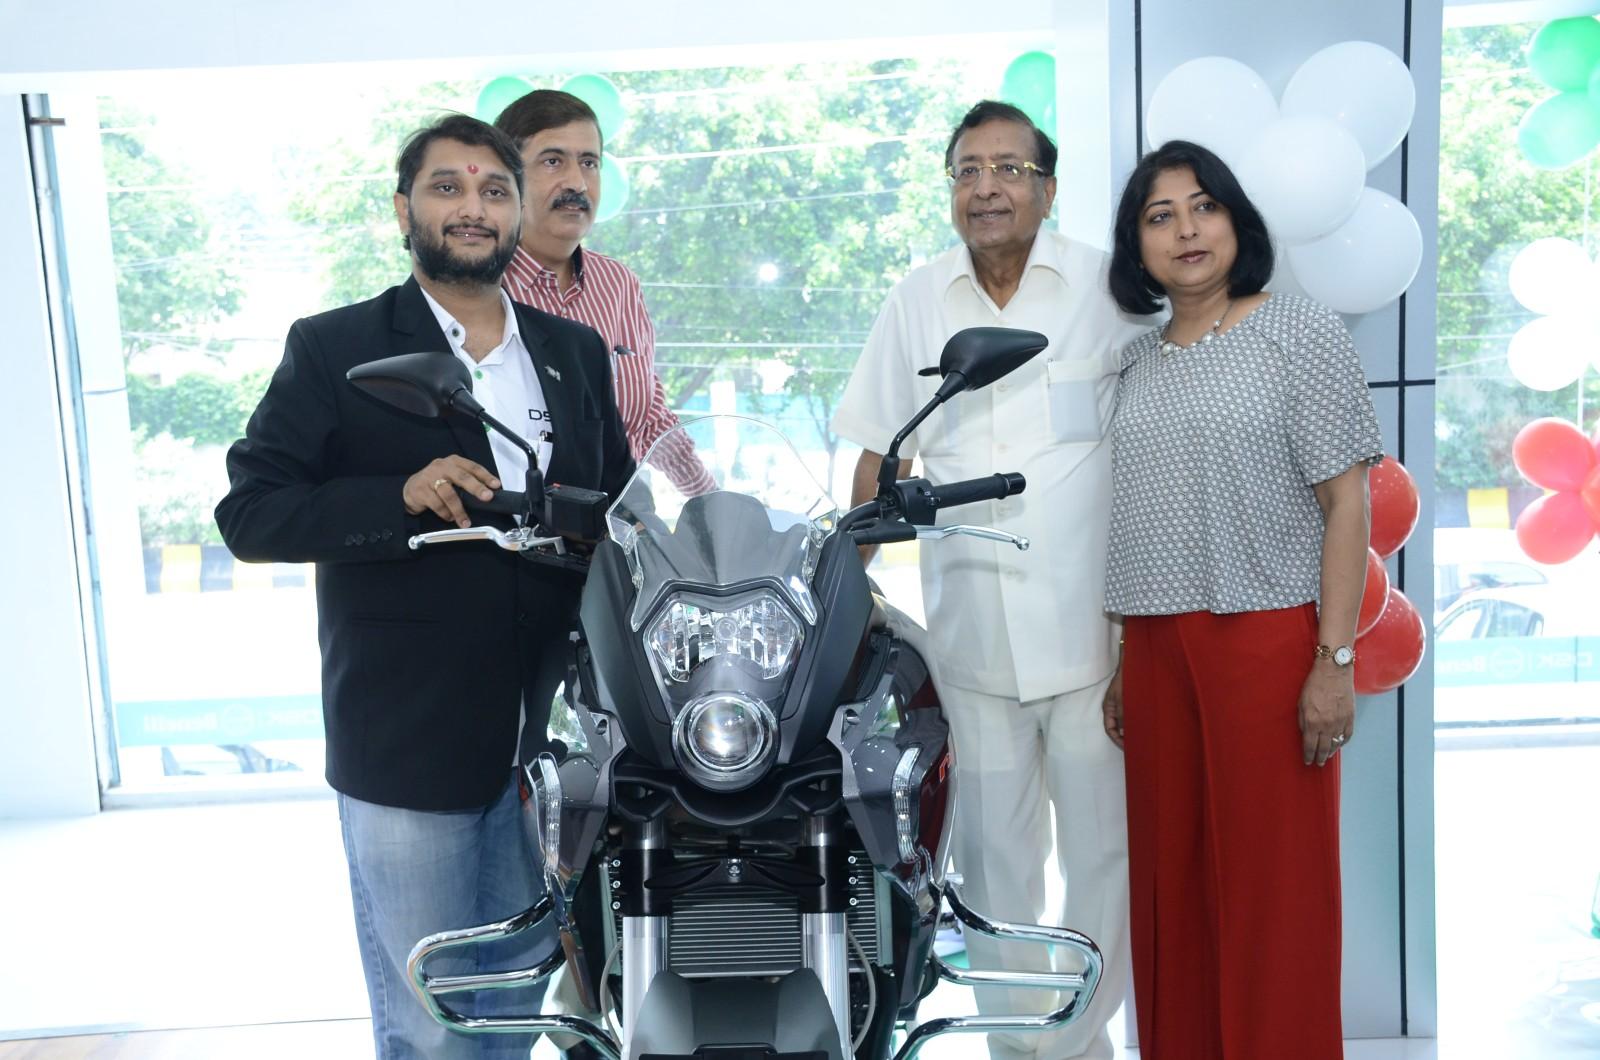 DSK Benelli inaugurates new showroom in Jalandhar - Resized